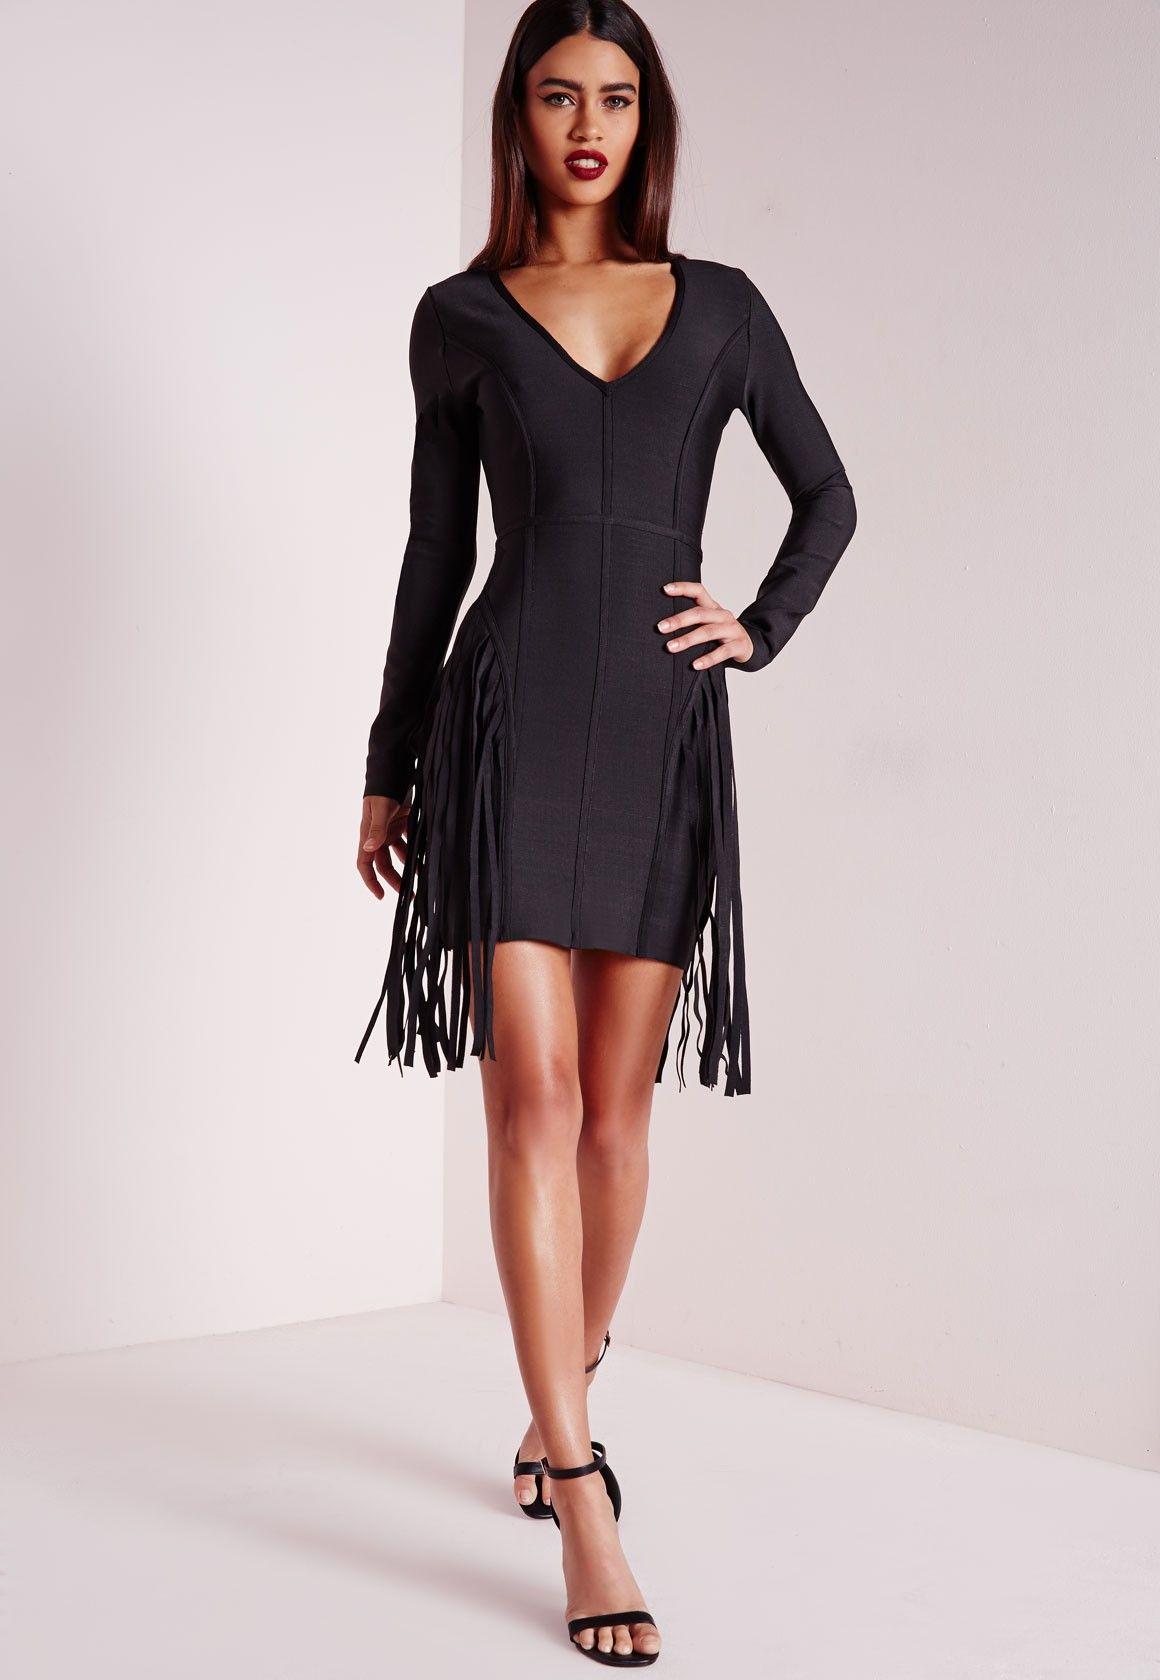 Missguided Premium Bandage Fringe Long Sleeve Bodycon Dress Black Black Long Sleeve Cocktail Dress Long Sleeve Bodycon Dress Black Bodycon Dress Long Sleeve [ 1680 x 1160 Pixel ]